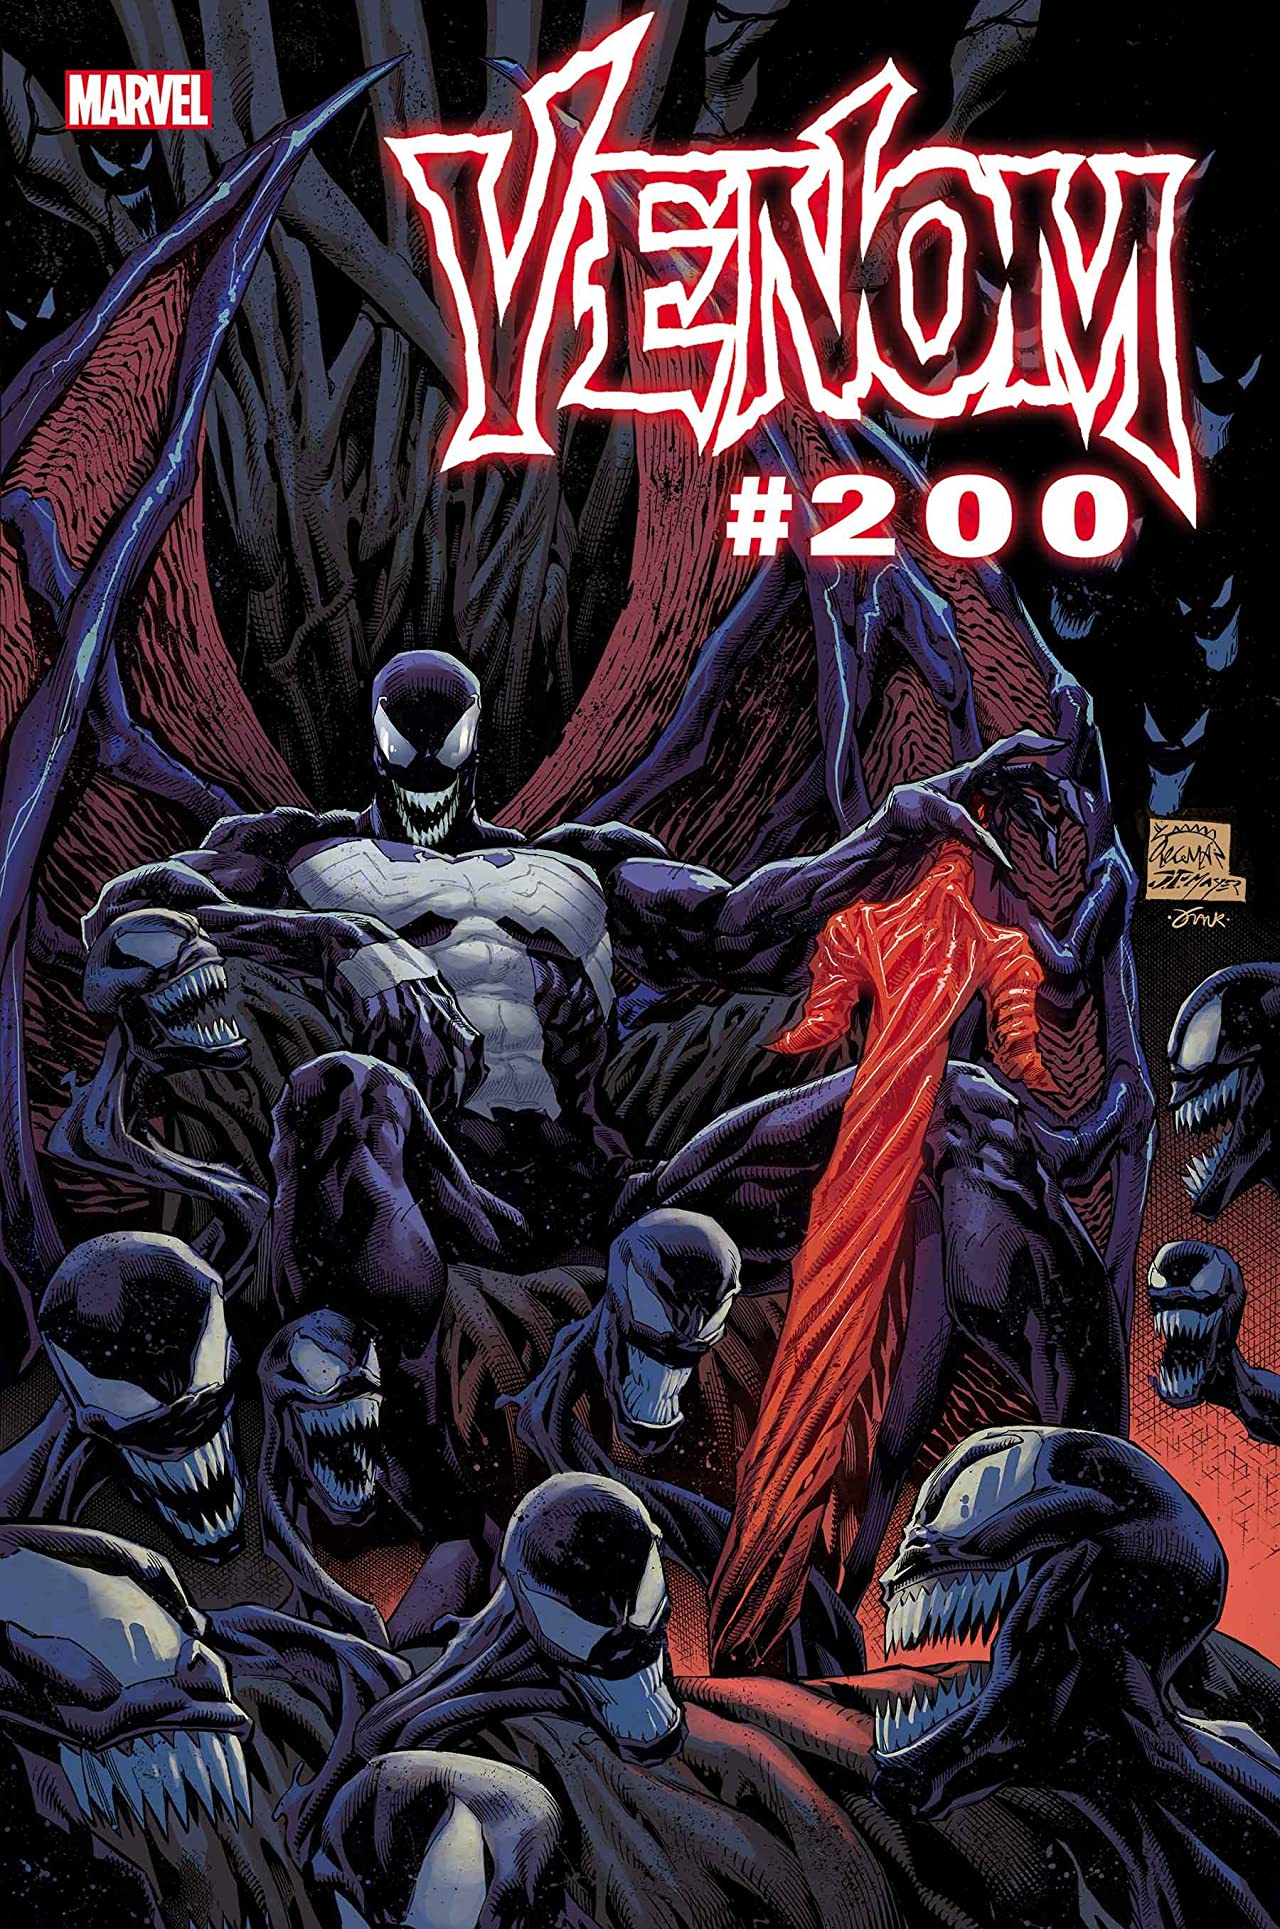 Venom #200 - okładka